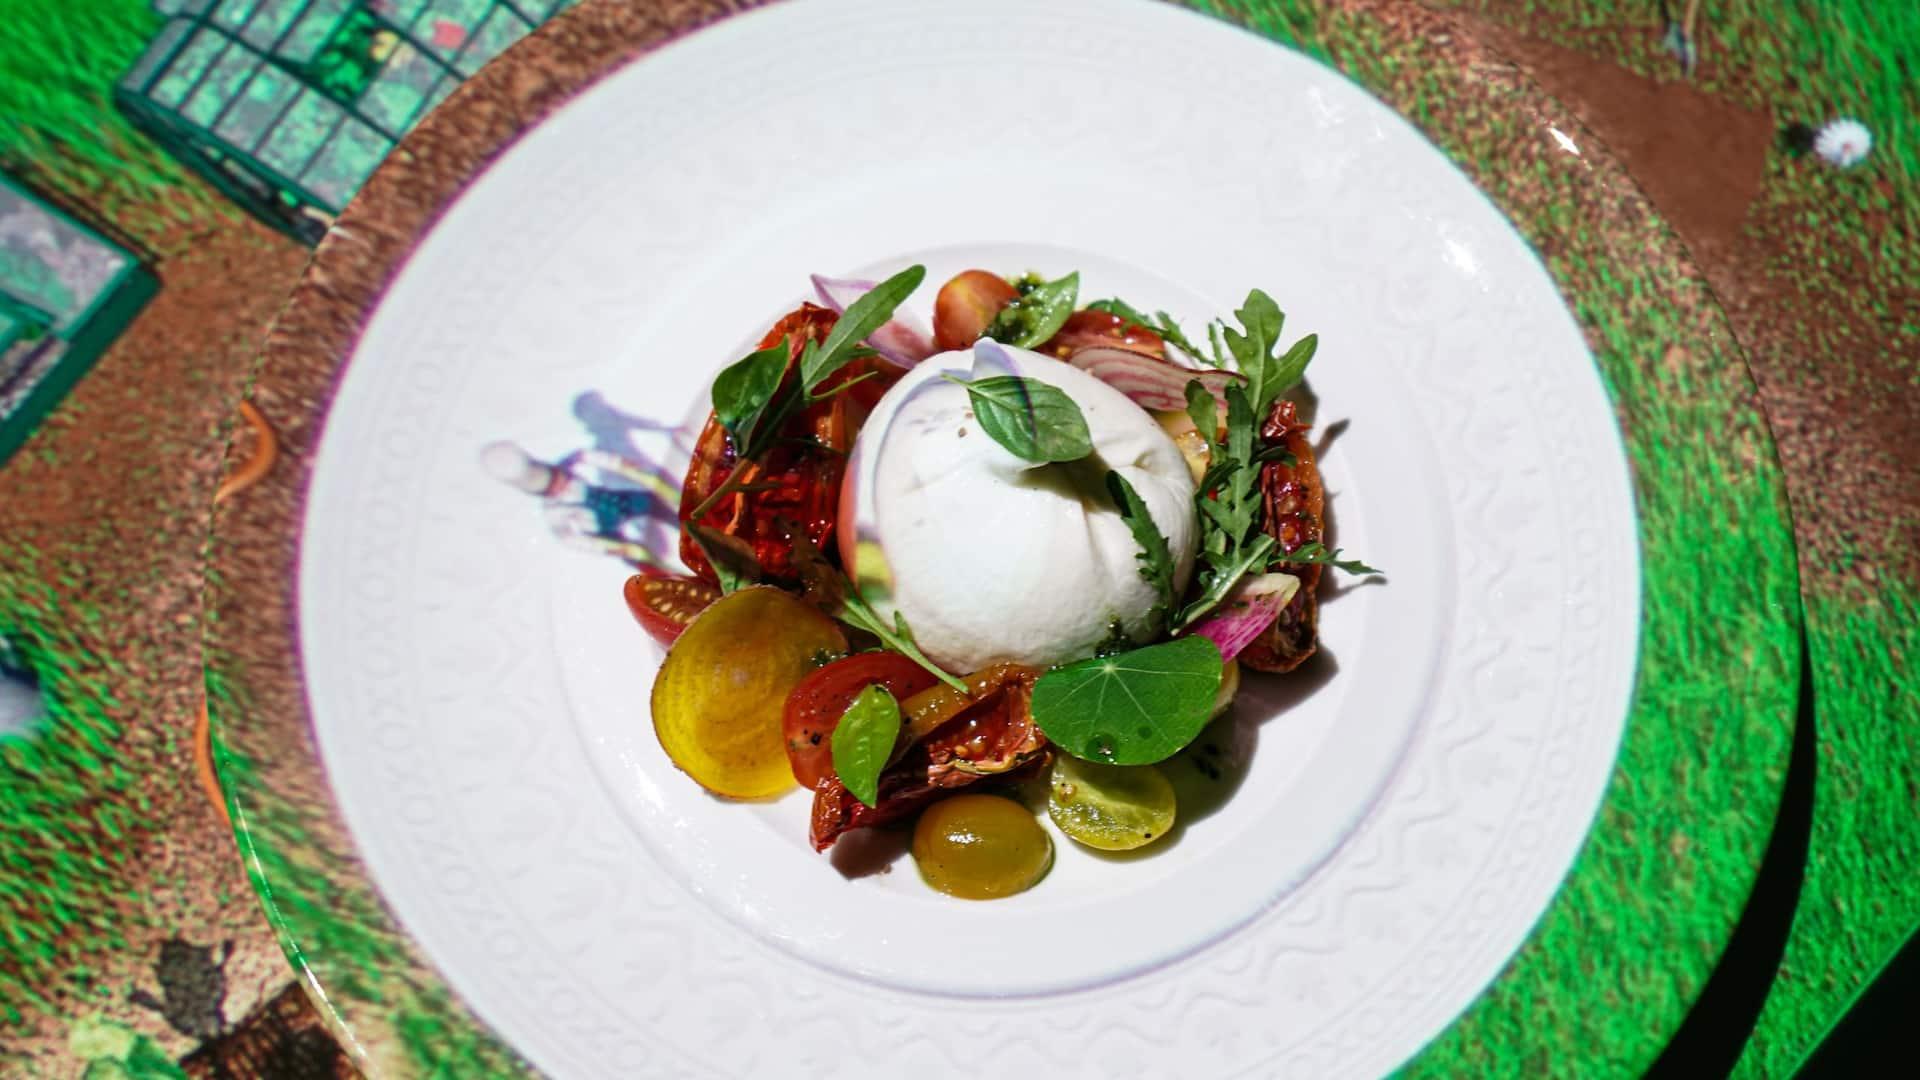 Grand Hyatt Bali Le Petit Chef Dining Experience